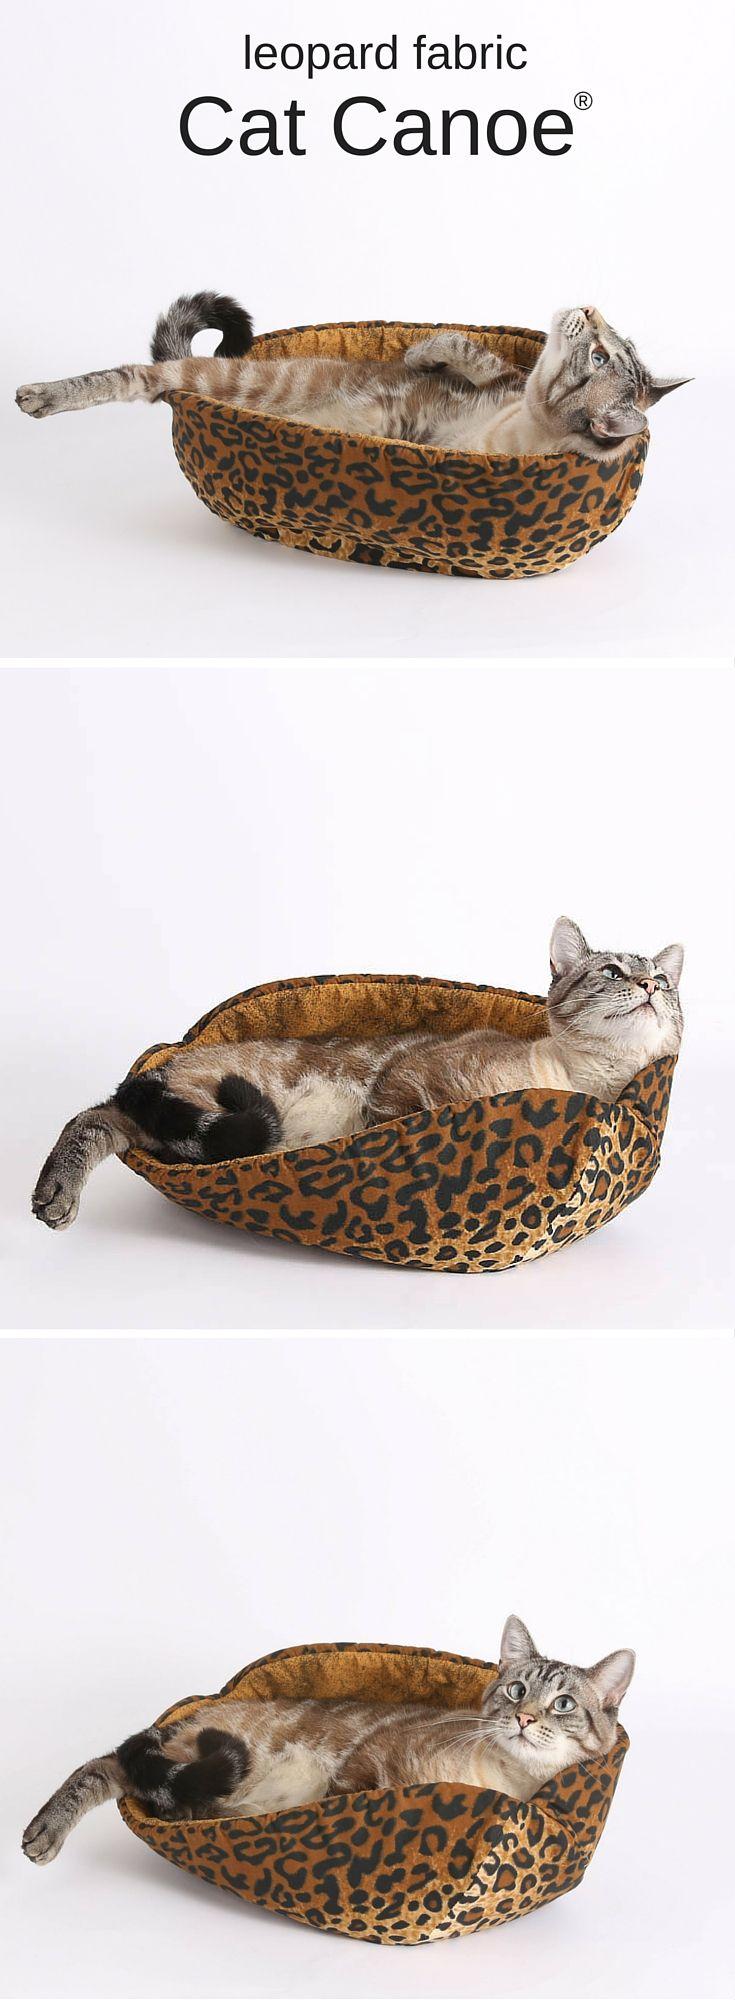 the  best modern cat beds ideas on pinterest  modern cat  - the cat canoe a modern kitty bed made in leopard fabric